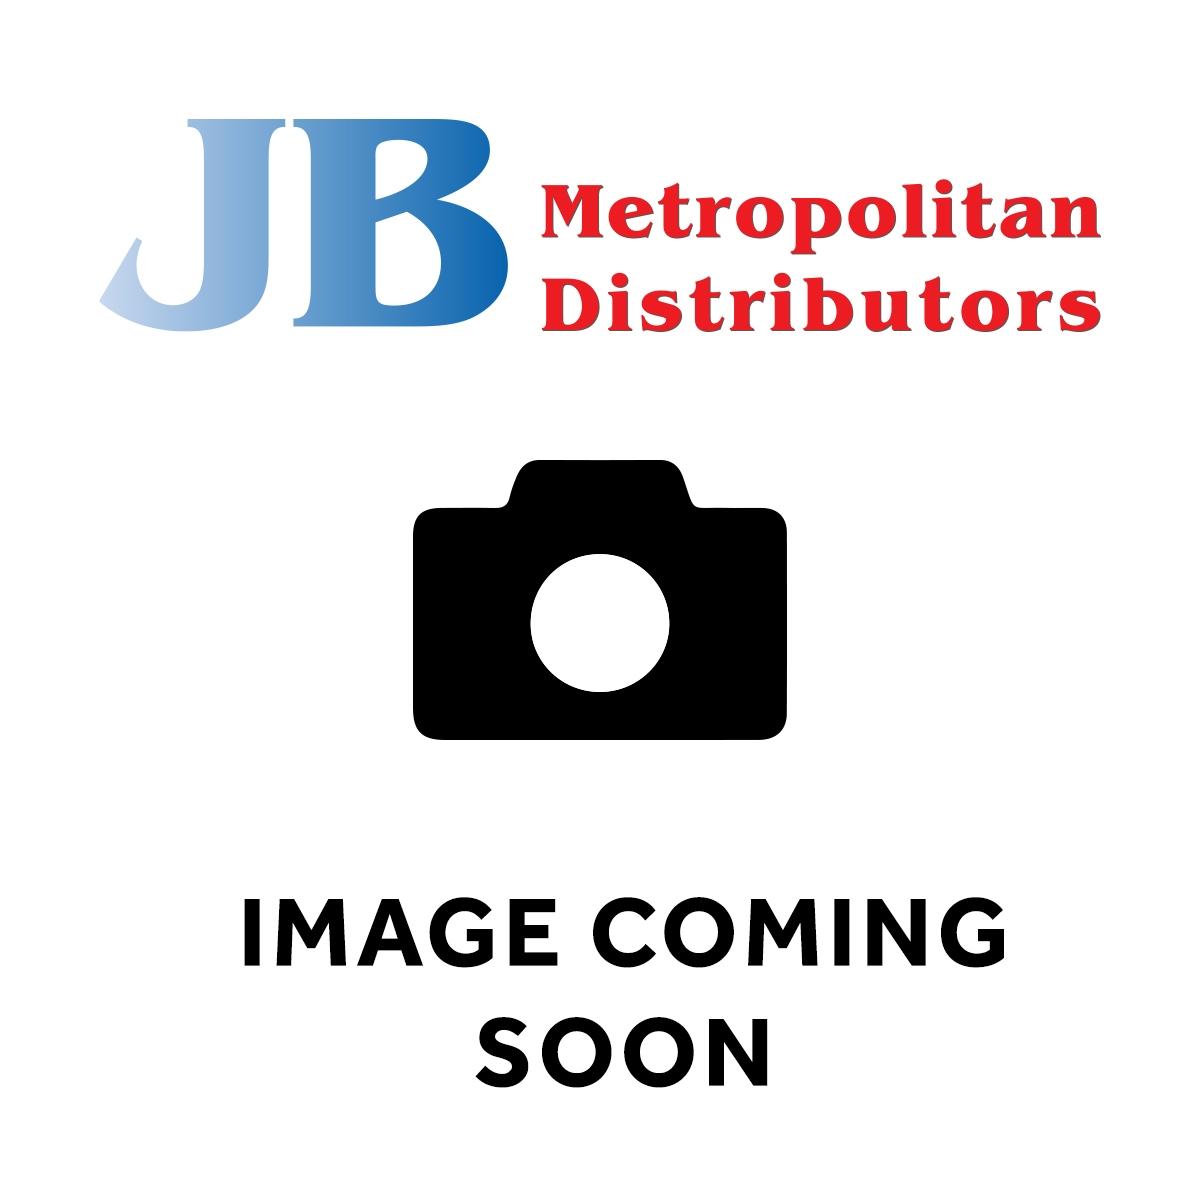 175G MRS MACS FAMOUS BEEF PIES